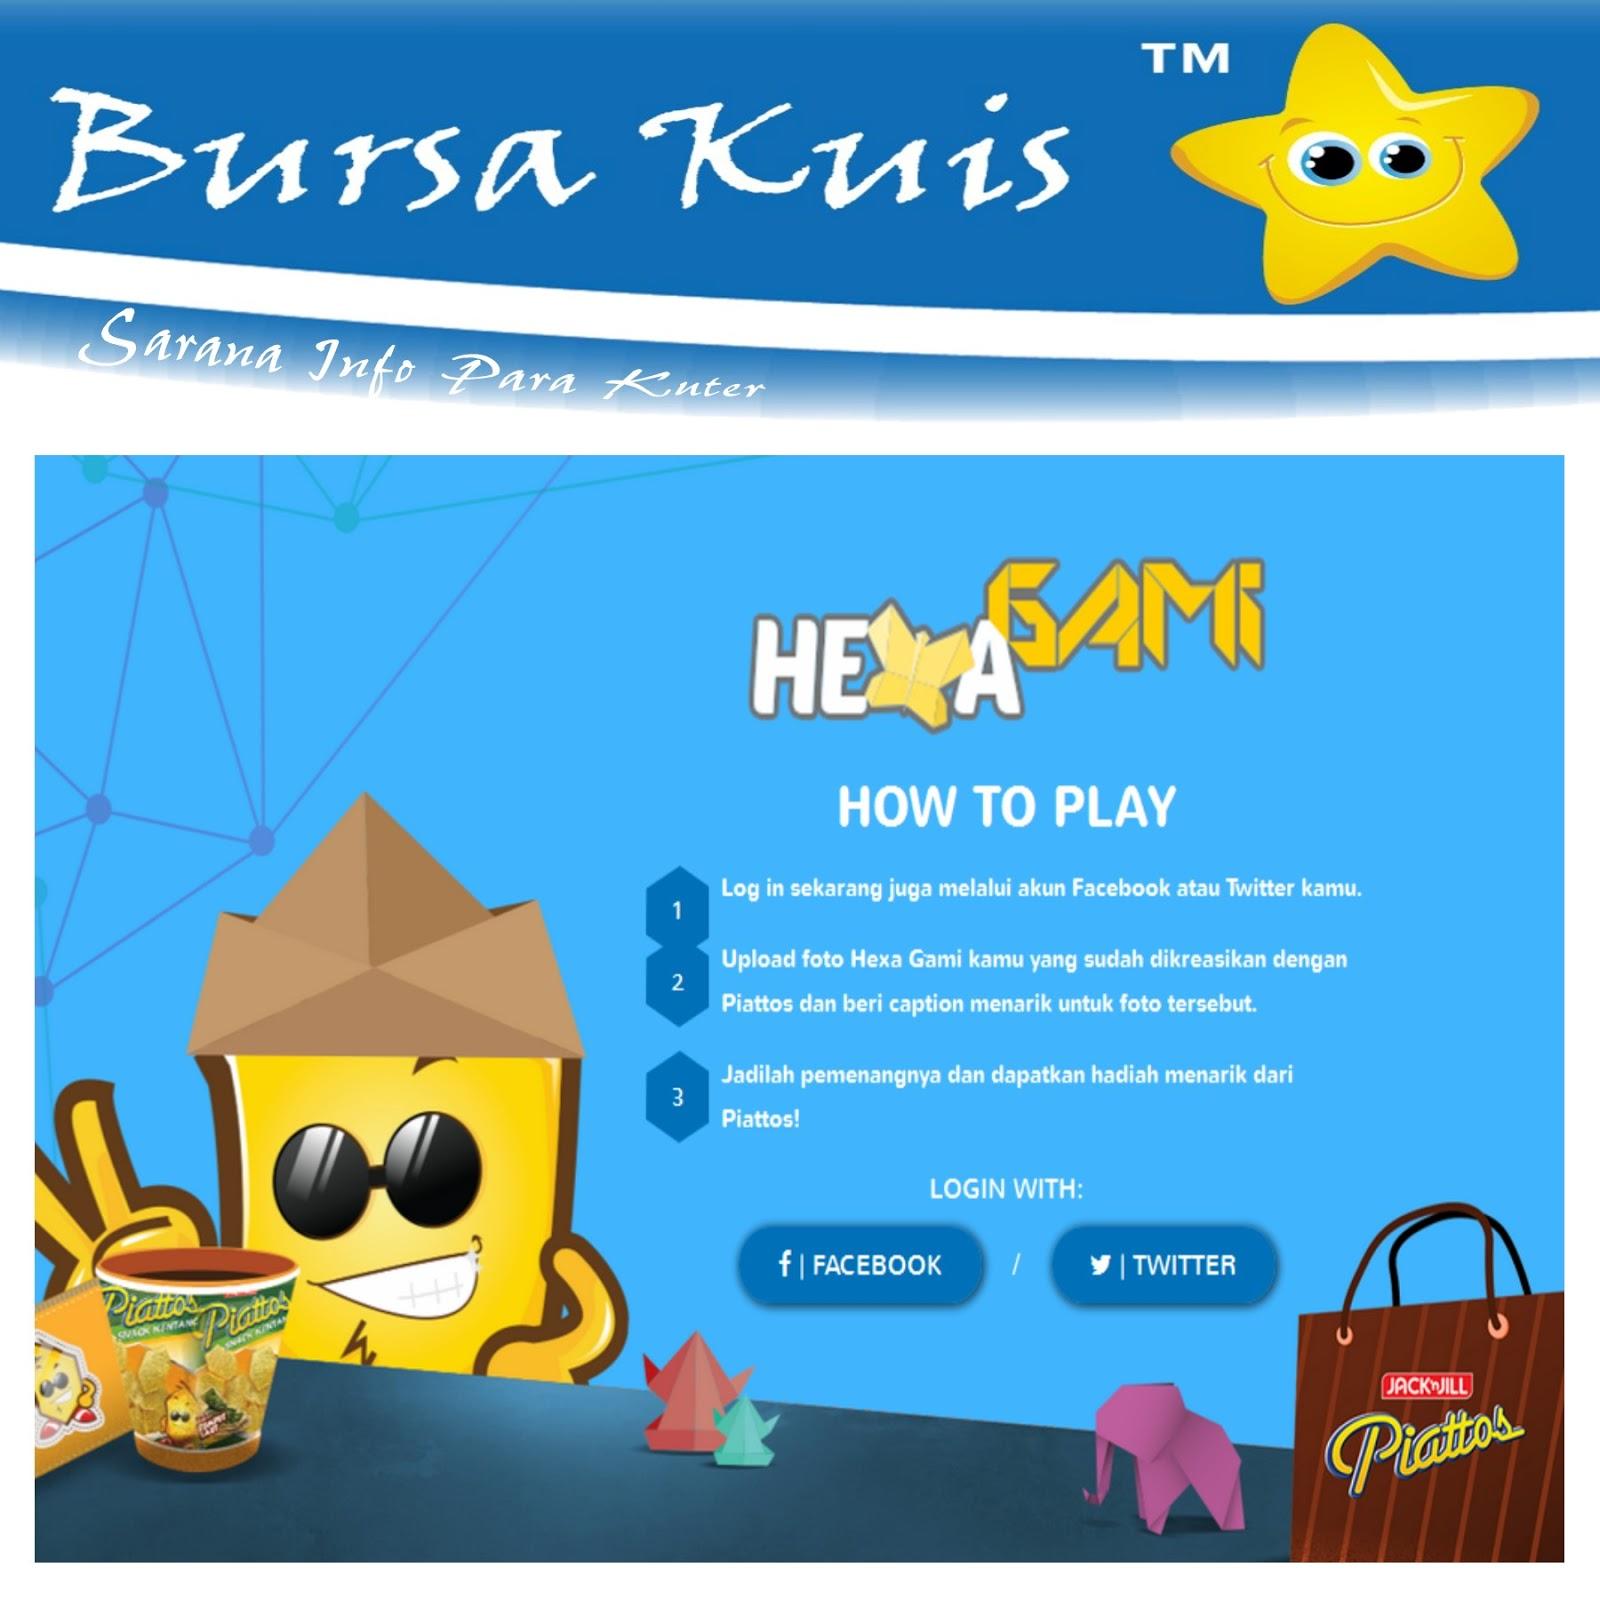 kontes foto online hexa gami piattos berhadiah gadget